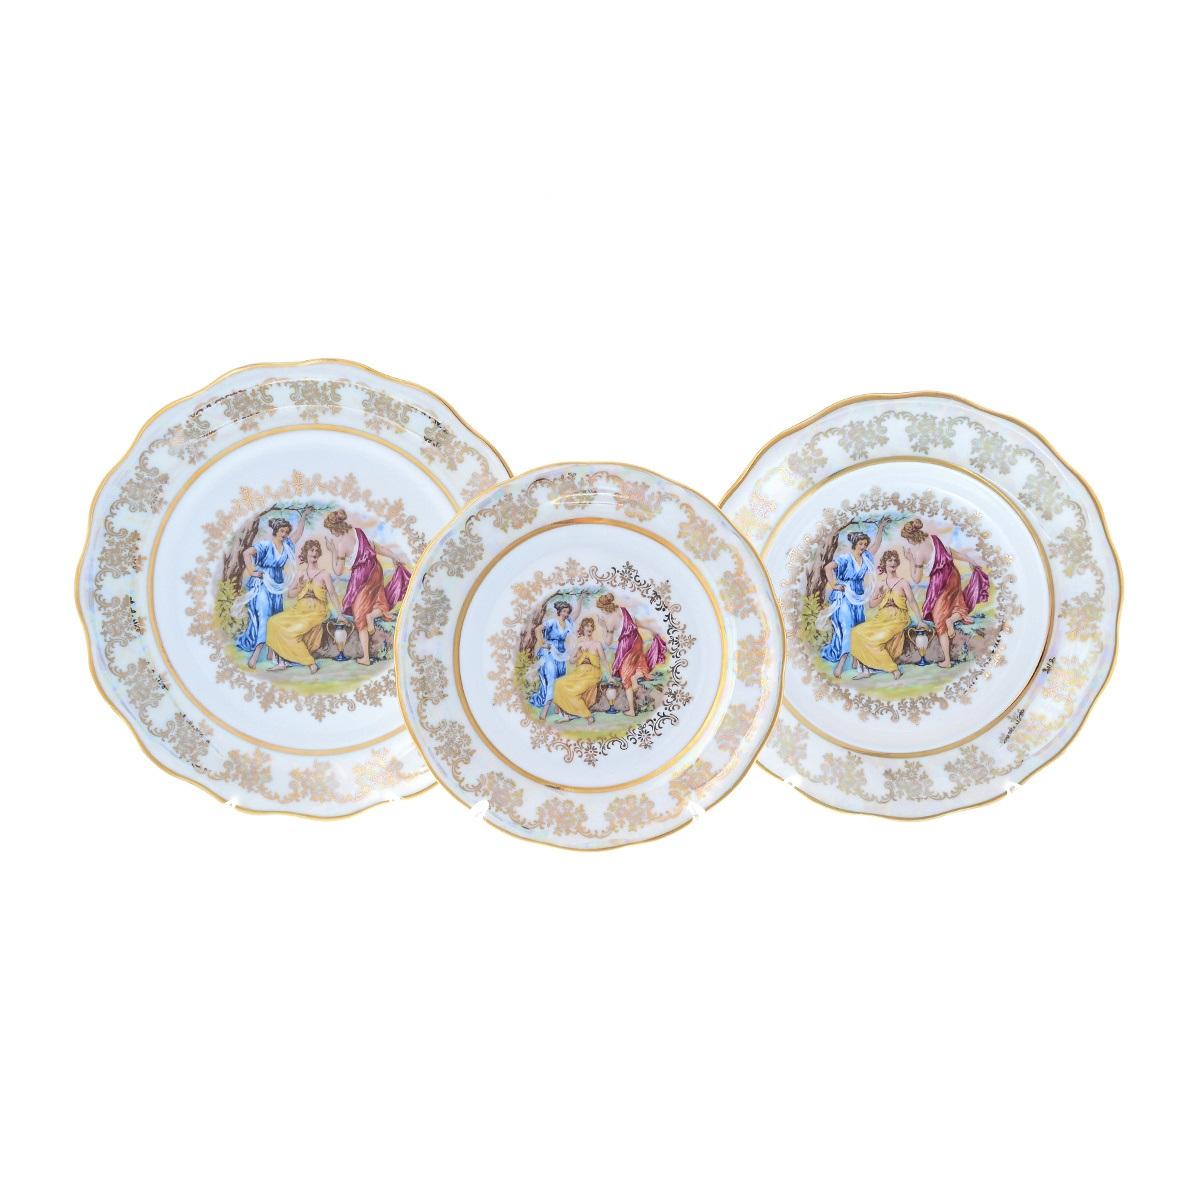 Набор фарфоровых тарелок МАДОННА ПЕРЛАМУТР от Queens Crown (Prince Porcelain) на 6 персон, 18 предметов